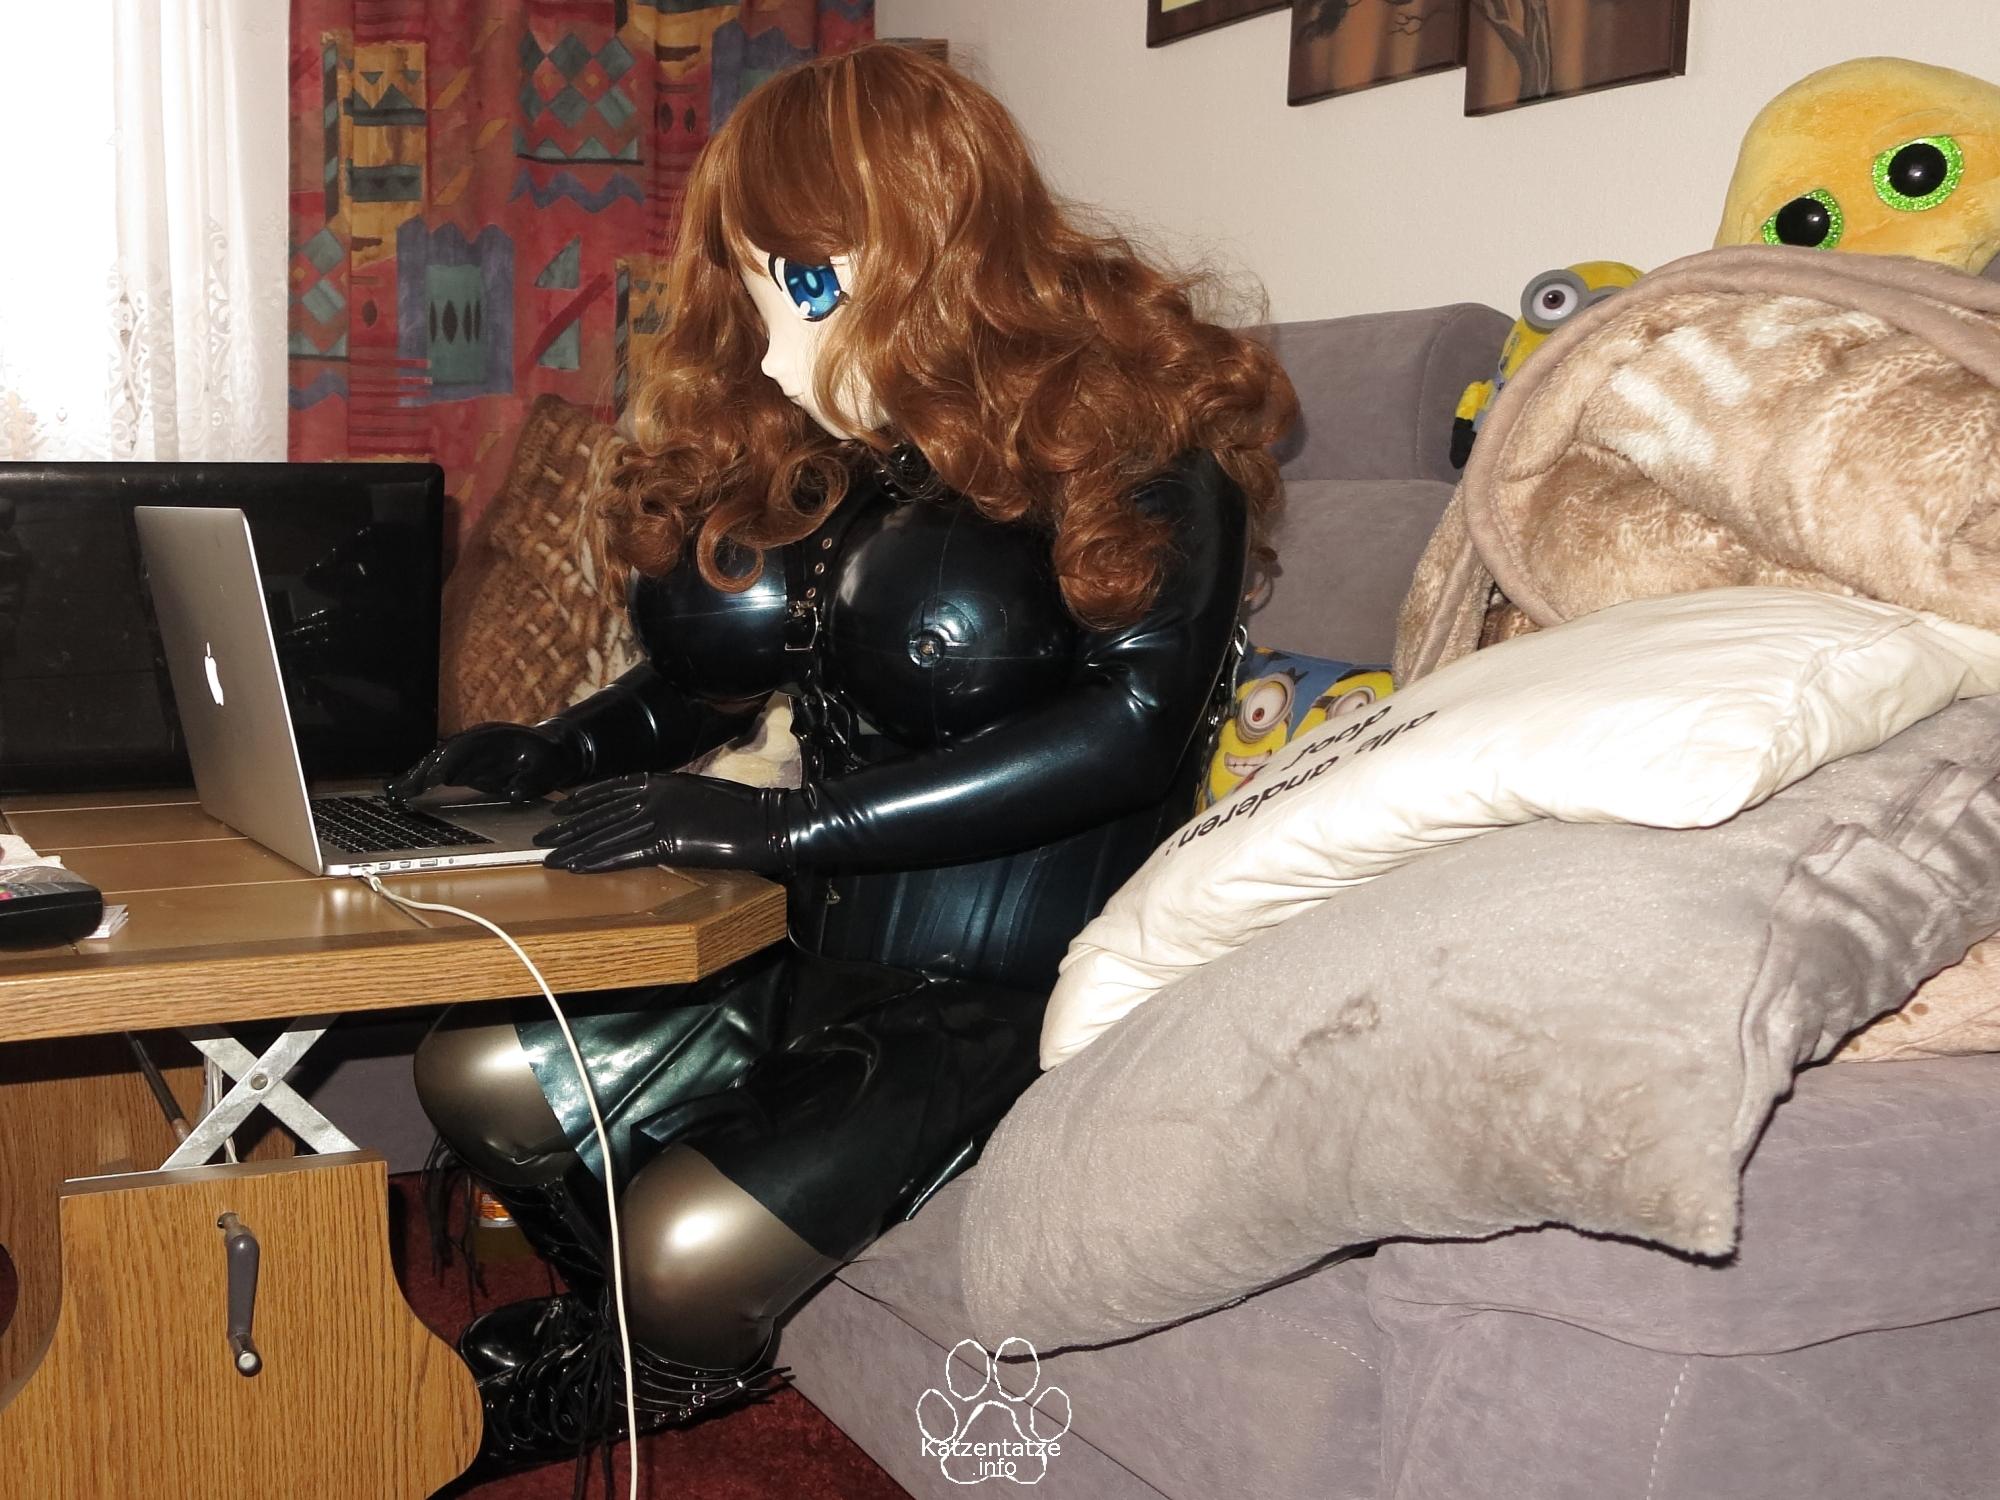 Asuka as hard working rubber maid